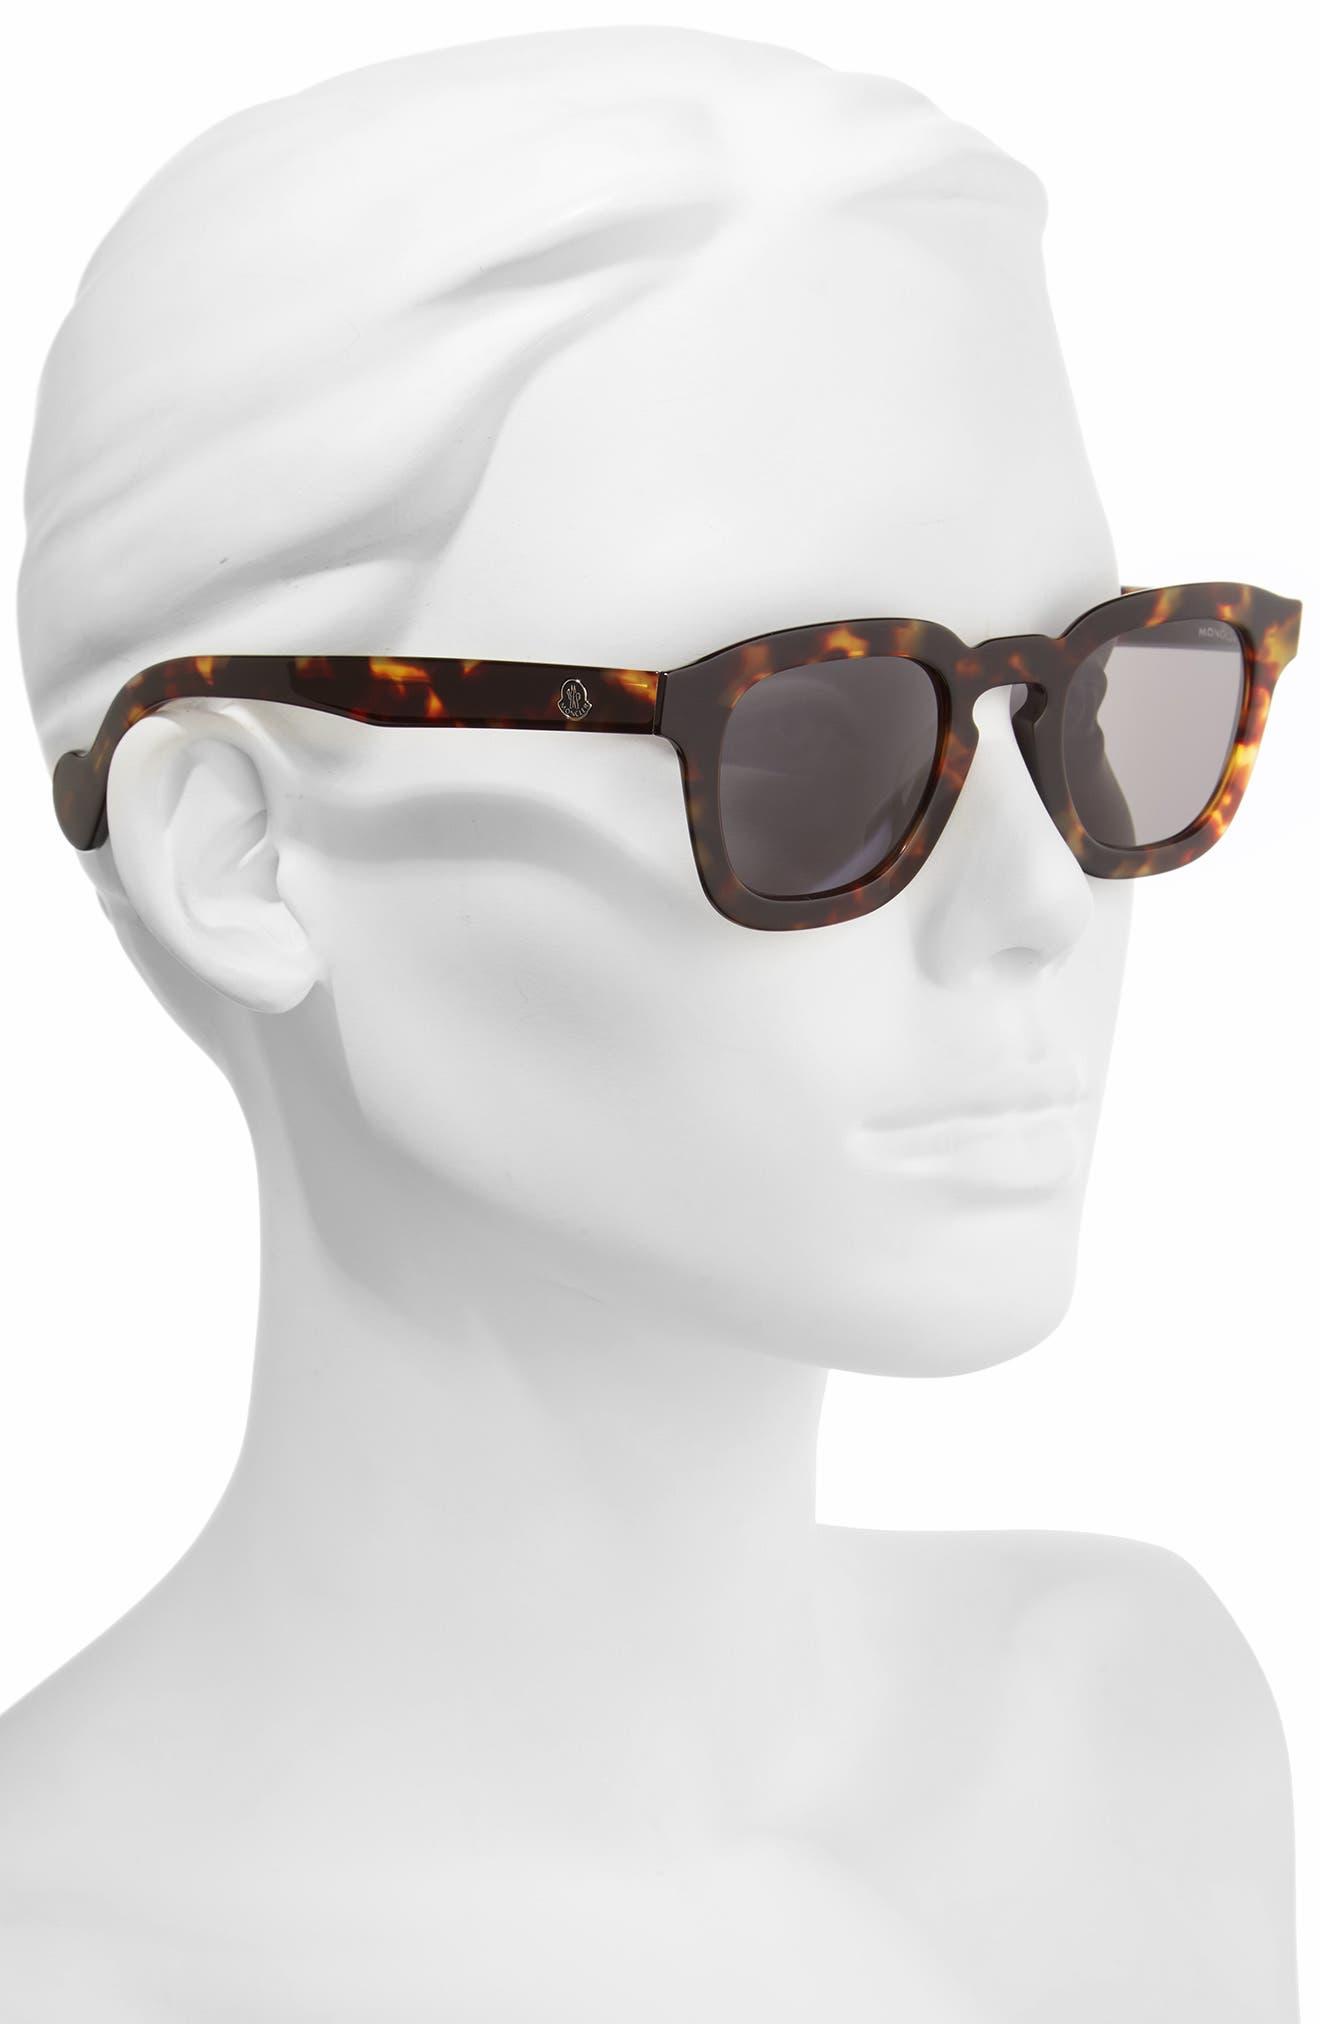 47mm Sunglasses,                             Alternate thumbnail 2, color,                             Dark Havana / Smoke